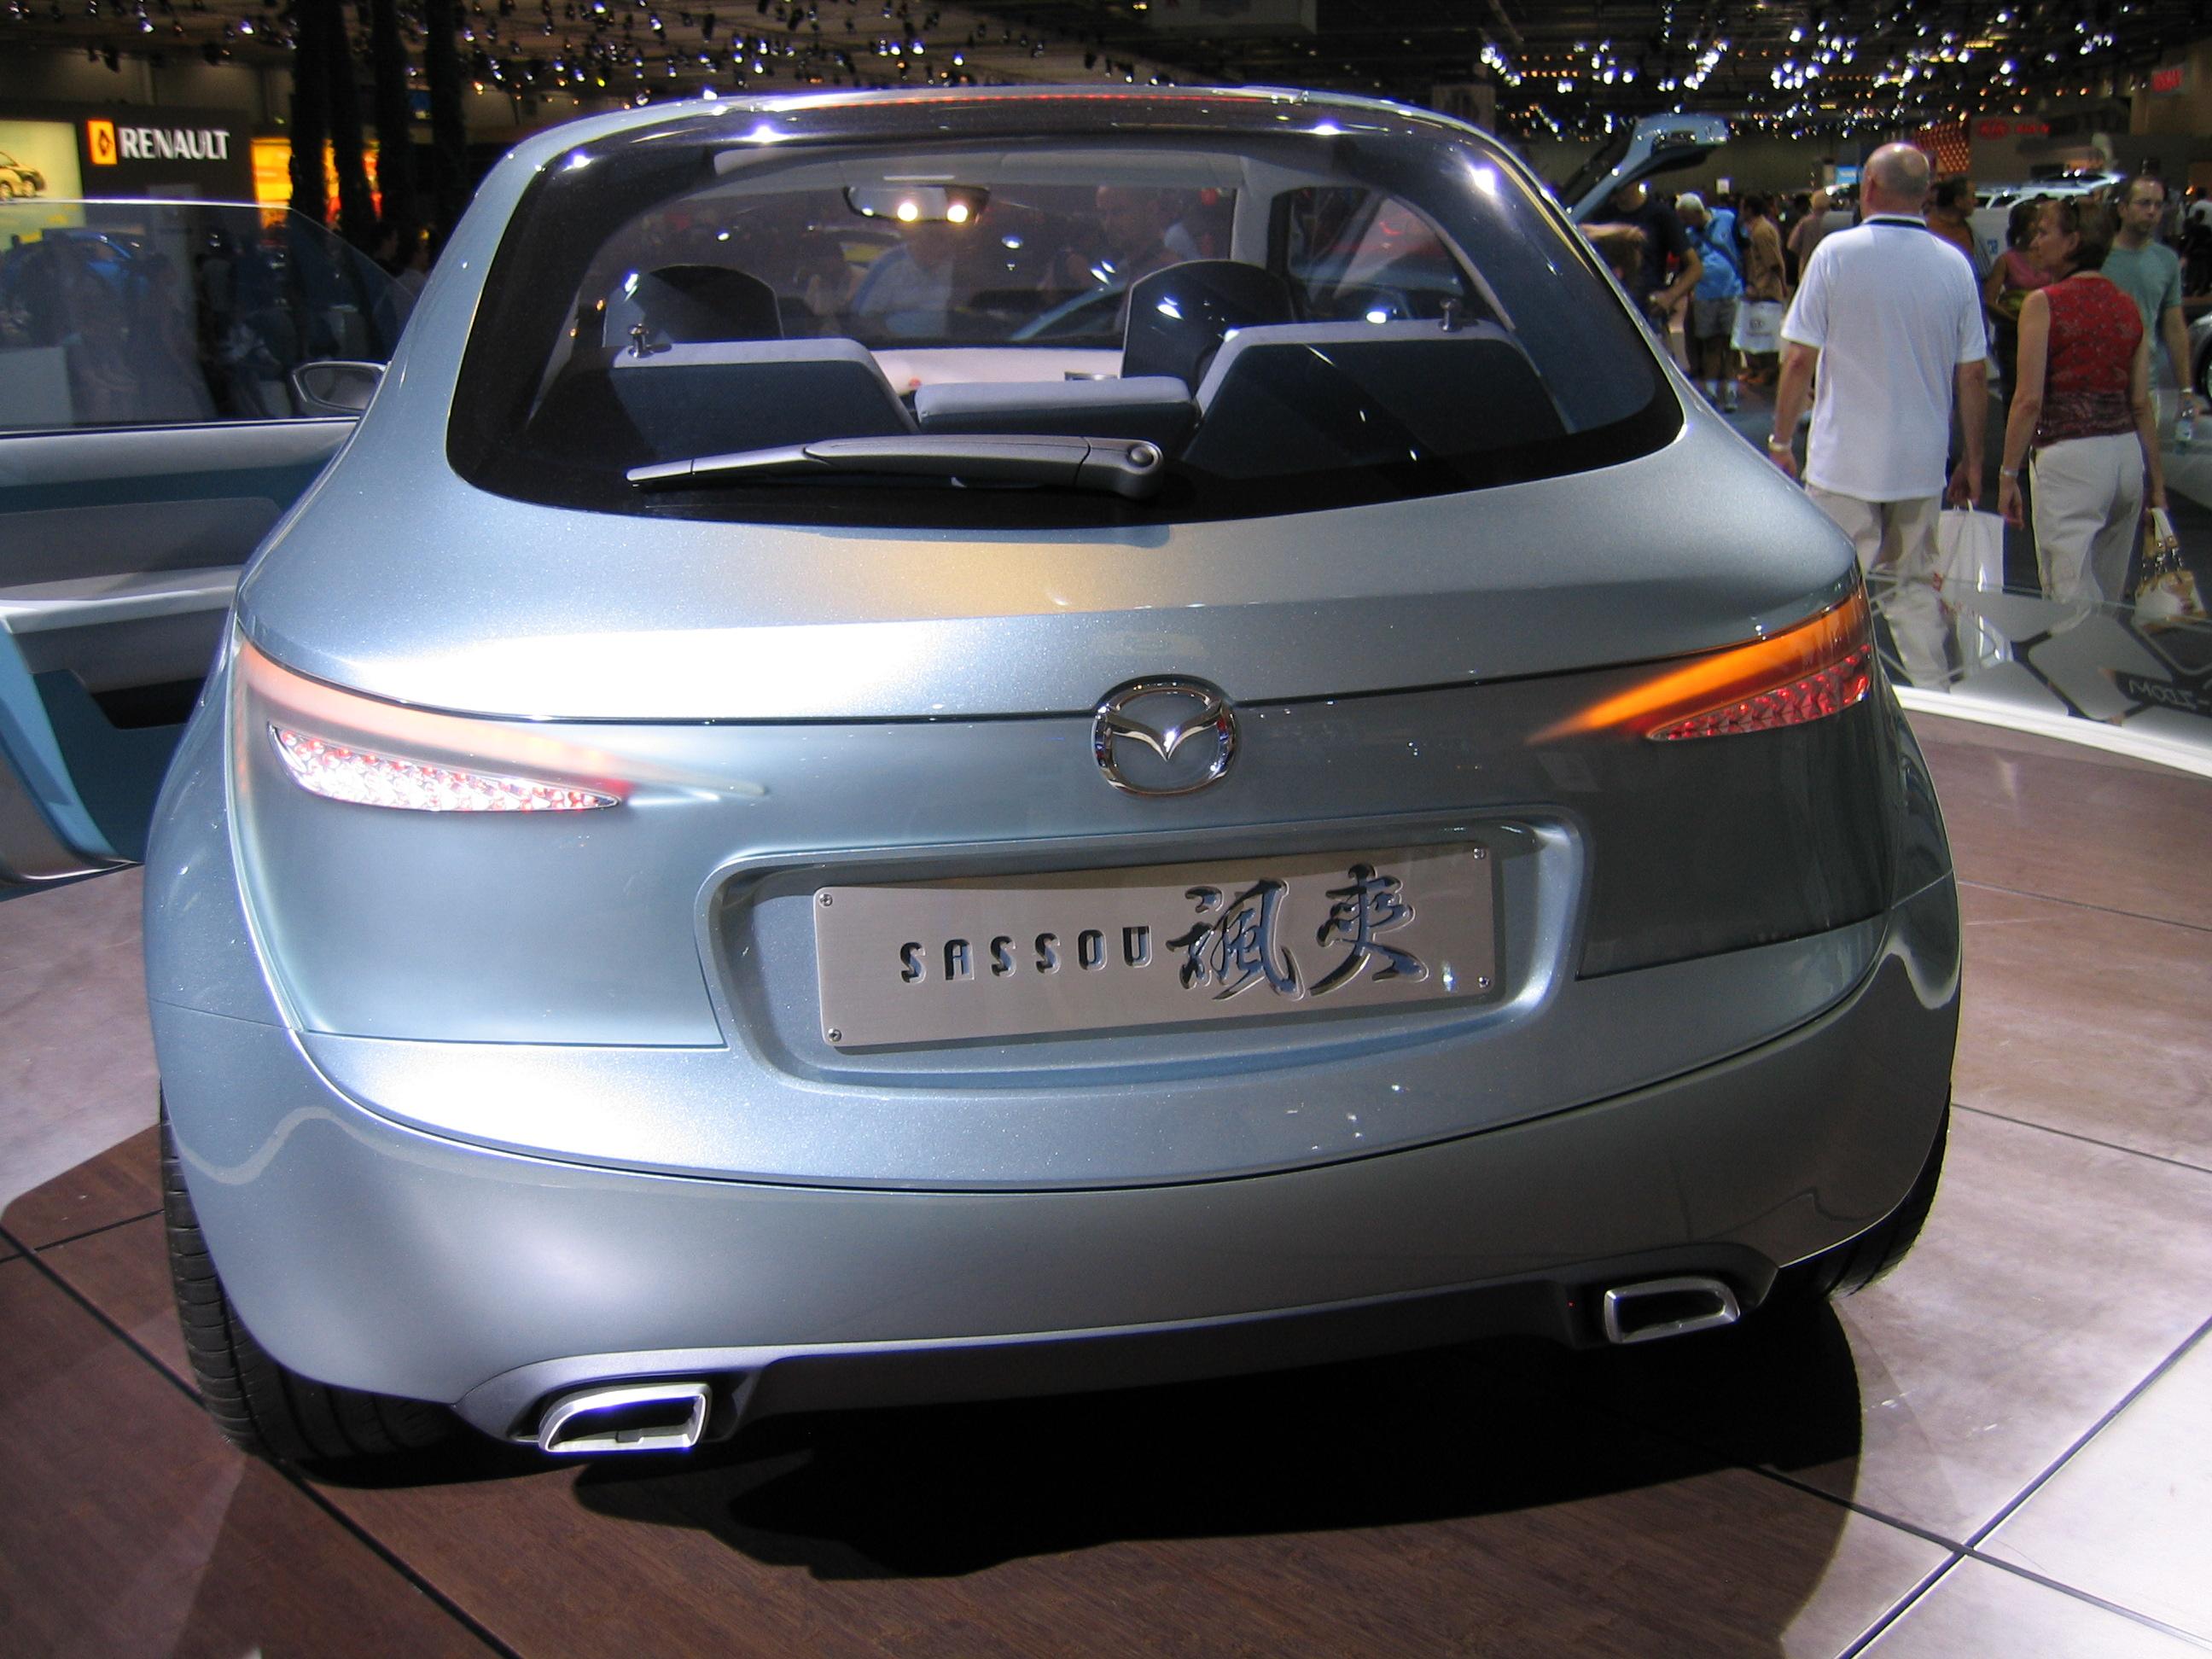 http://upload.wikimedia.org/wikipedia/commons/d/d3/Mazda_Sassou_Concept_Car_-_Flickr_-_robad0b_(2).jpg